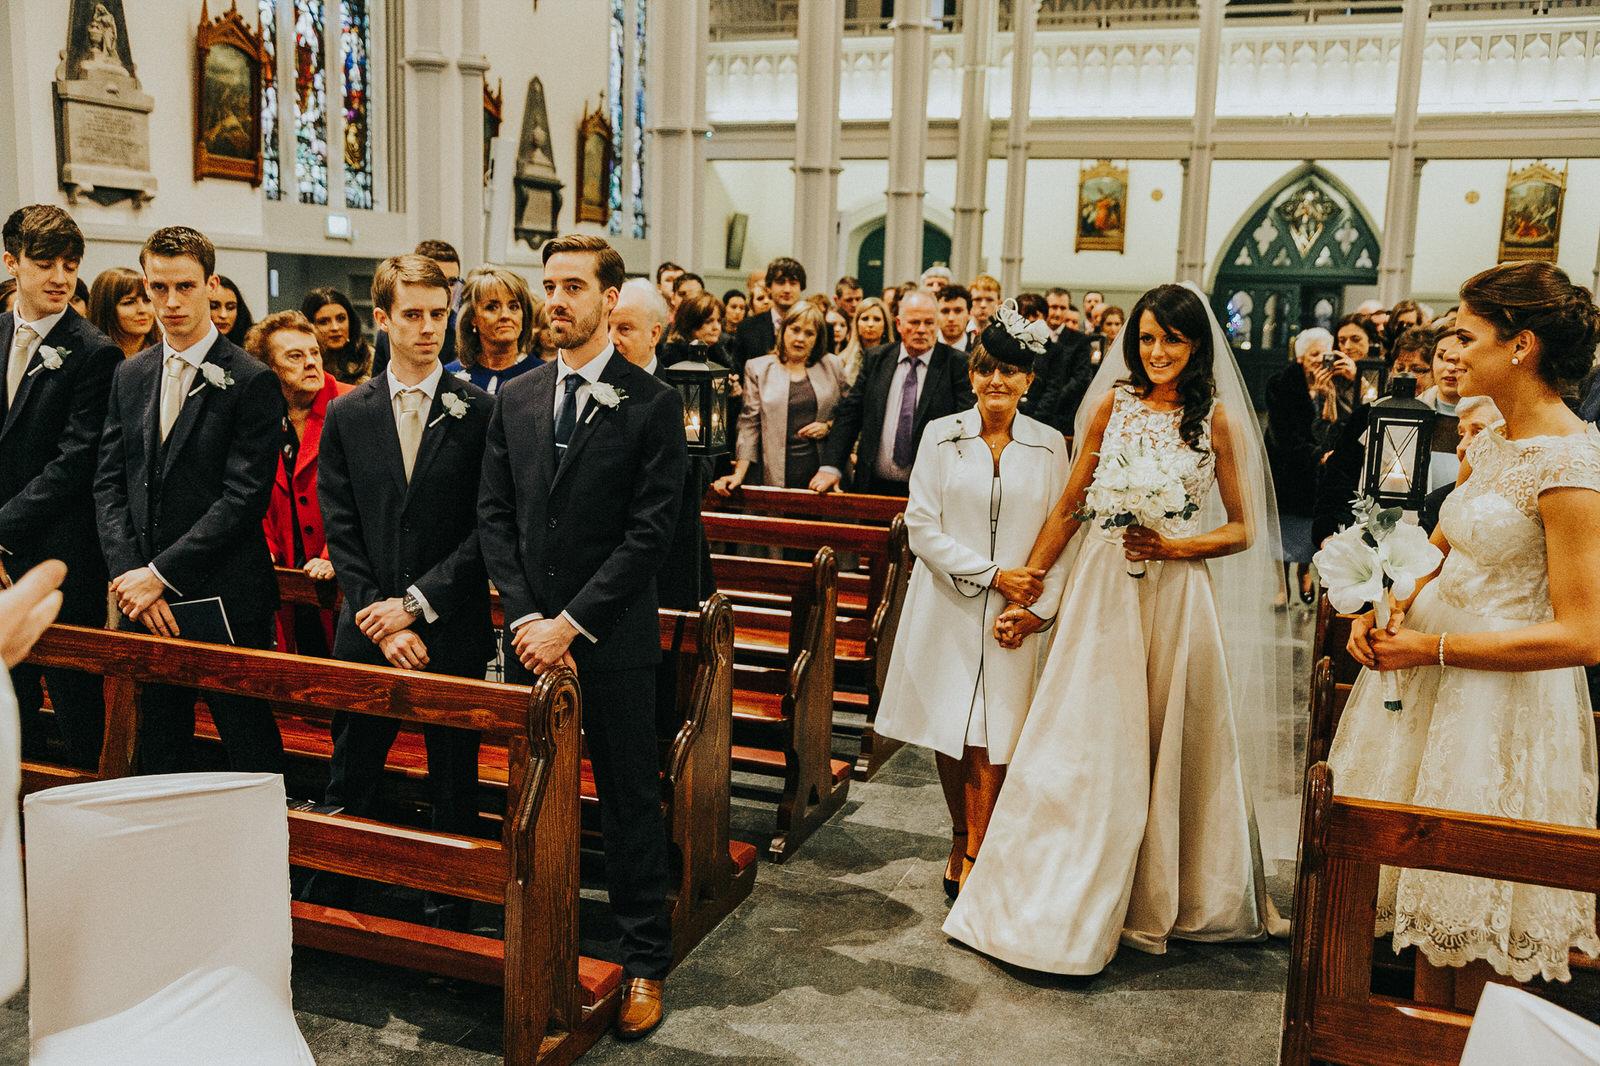 Roger_Kenny_wedding_photographer_430.jpg